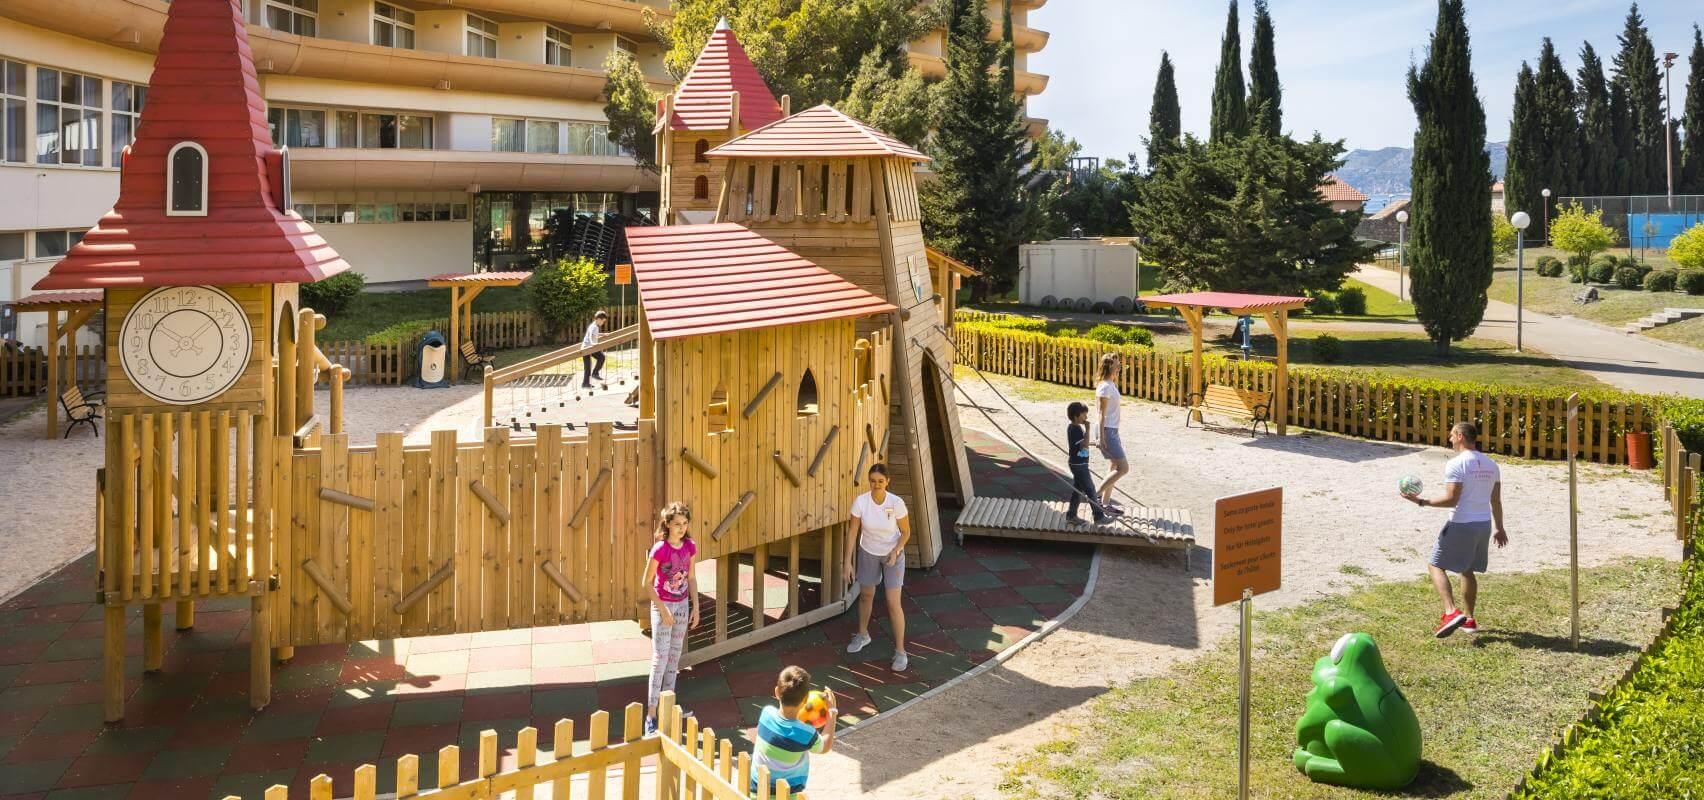 Hotel Albatros Cavtat In Croatia Remisens Kids Outdoor Fitness Circuit Free Printable This Fun Summer Activity Images Map